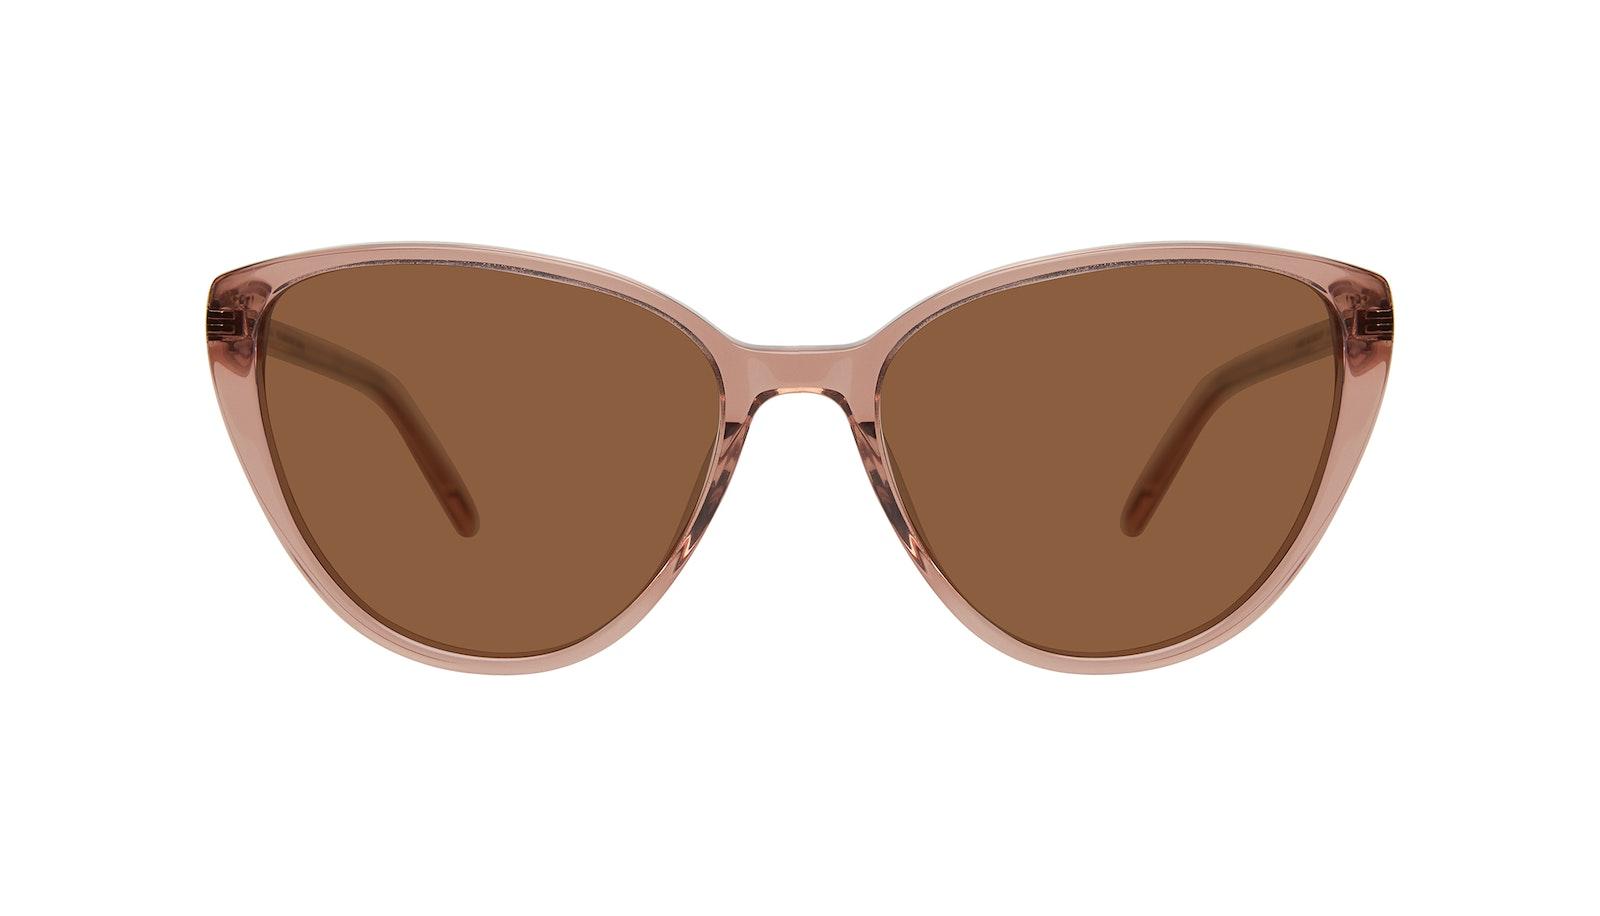 Affordable Fashion Glasses Cat Eye Sunglasses Women Poise Rose